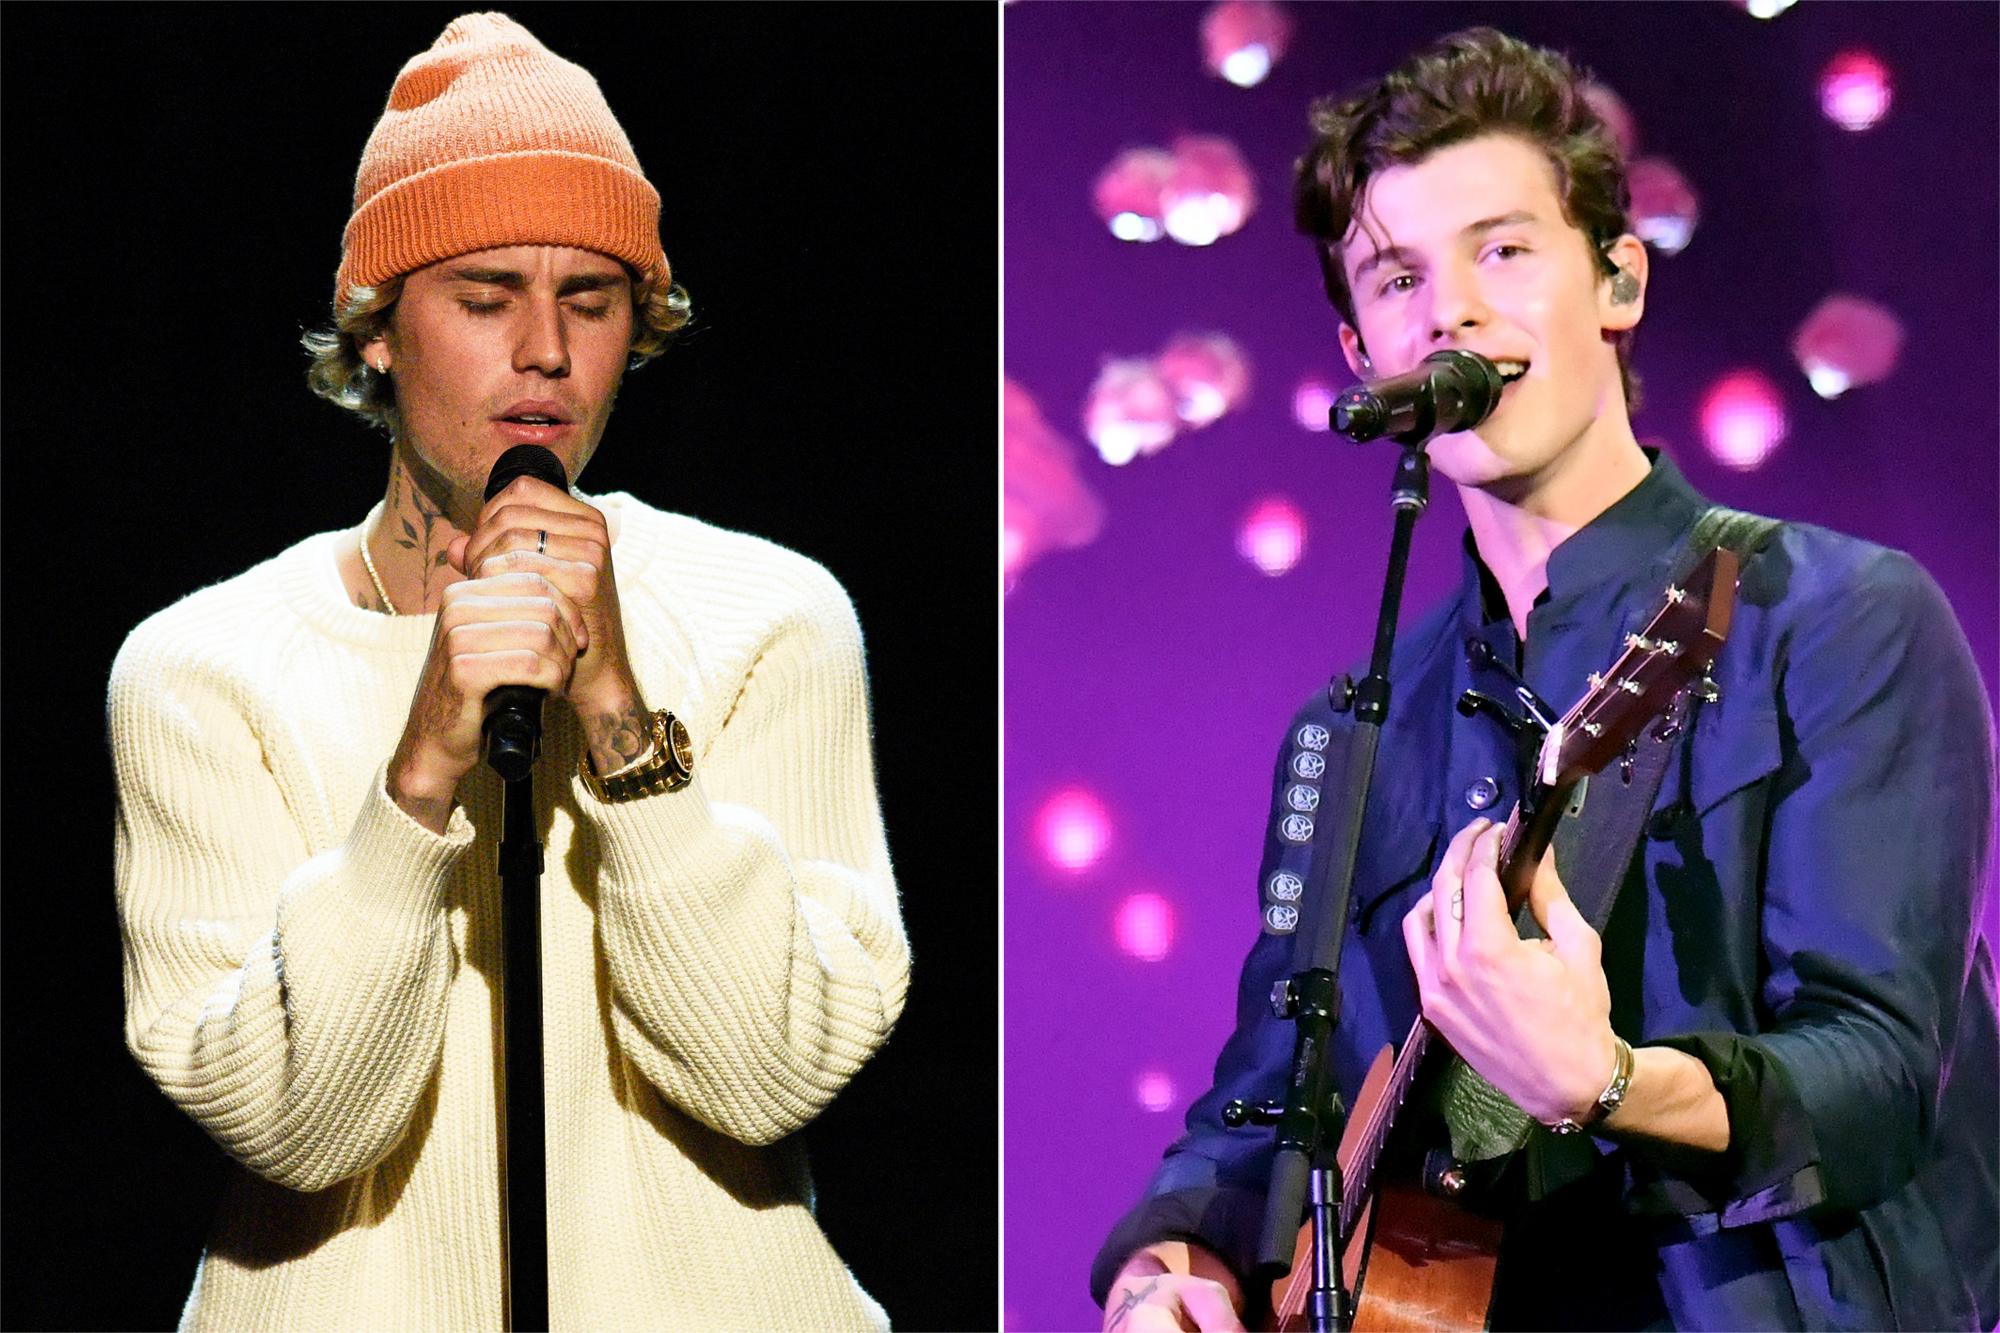 Justin Bieber, Shawn Mendes